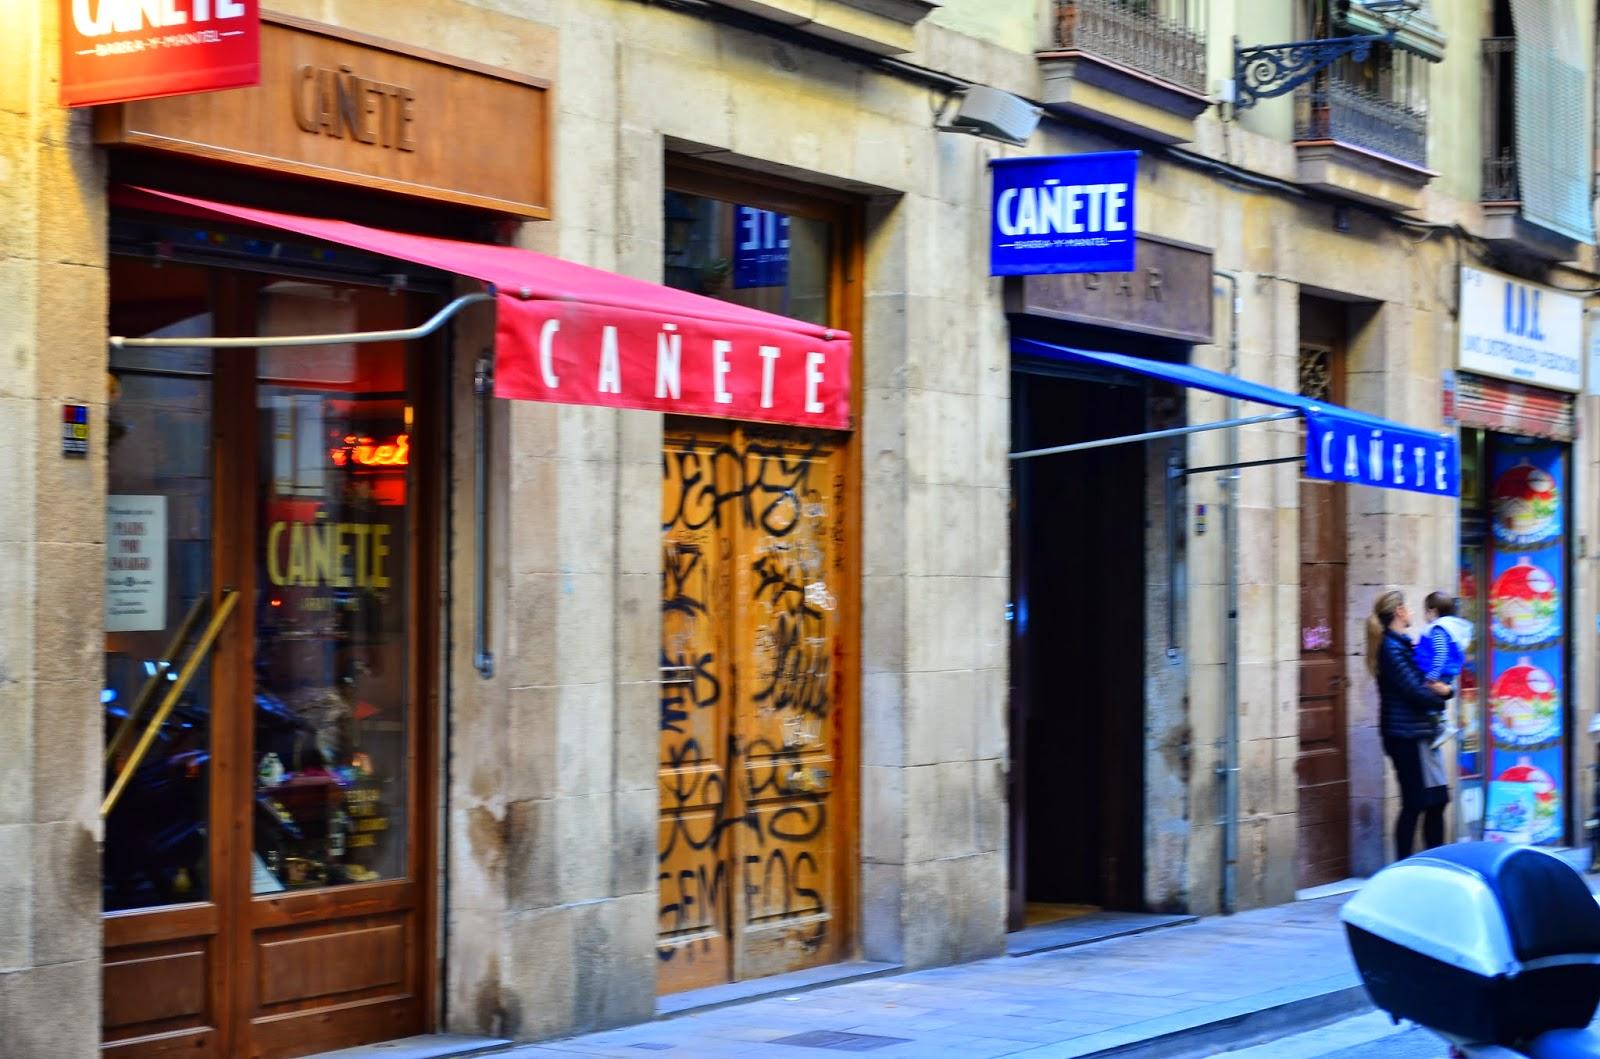 Hedofoodia: Bar Cañete, Barcelone